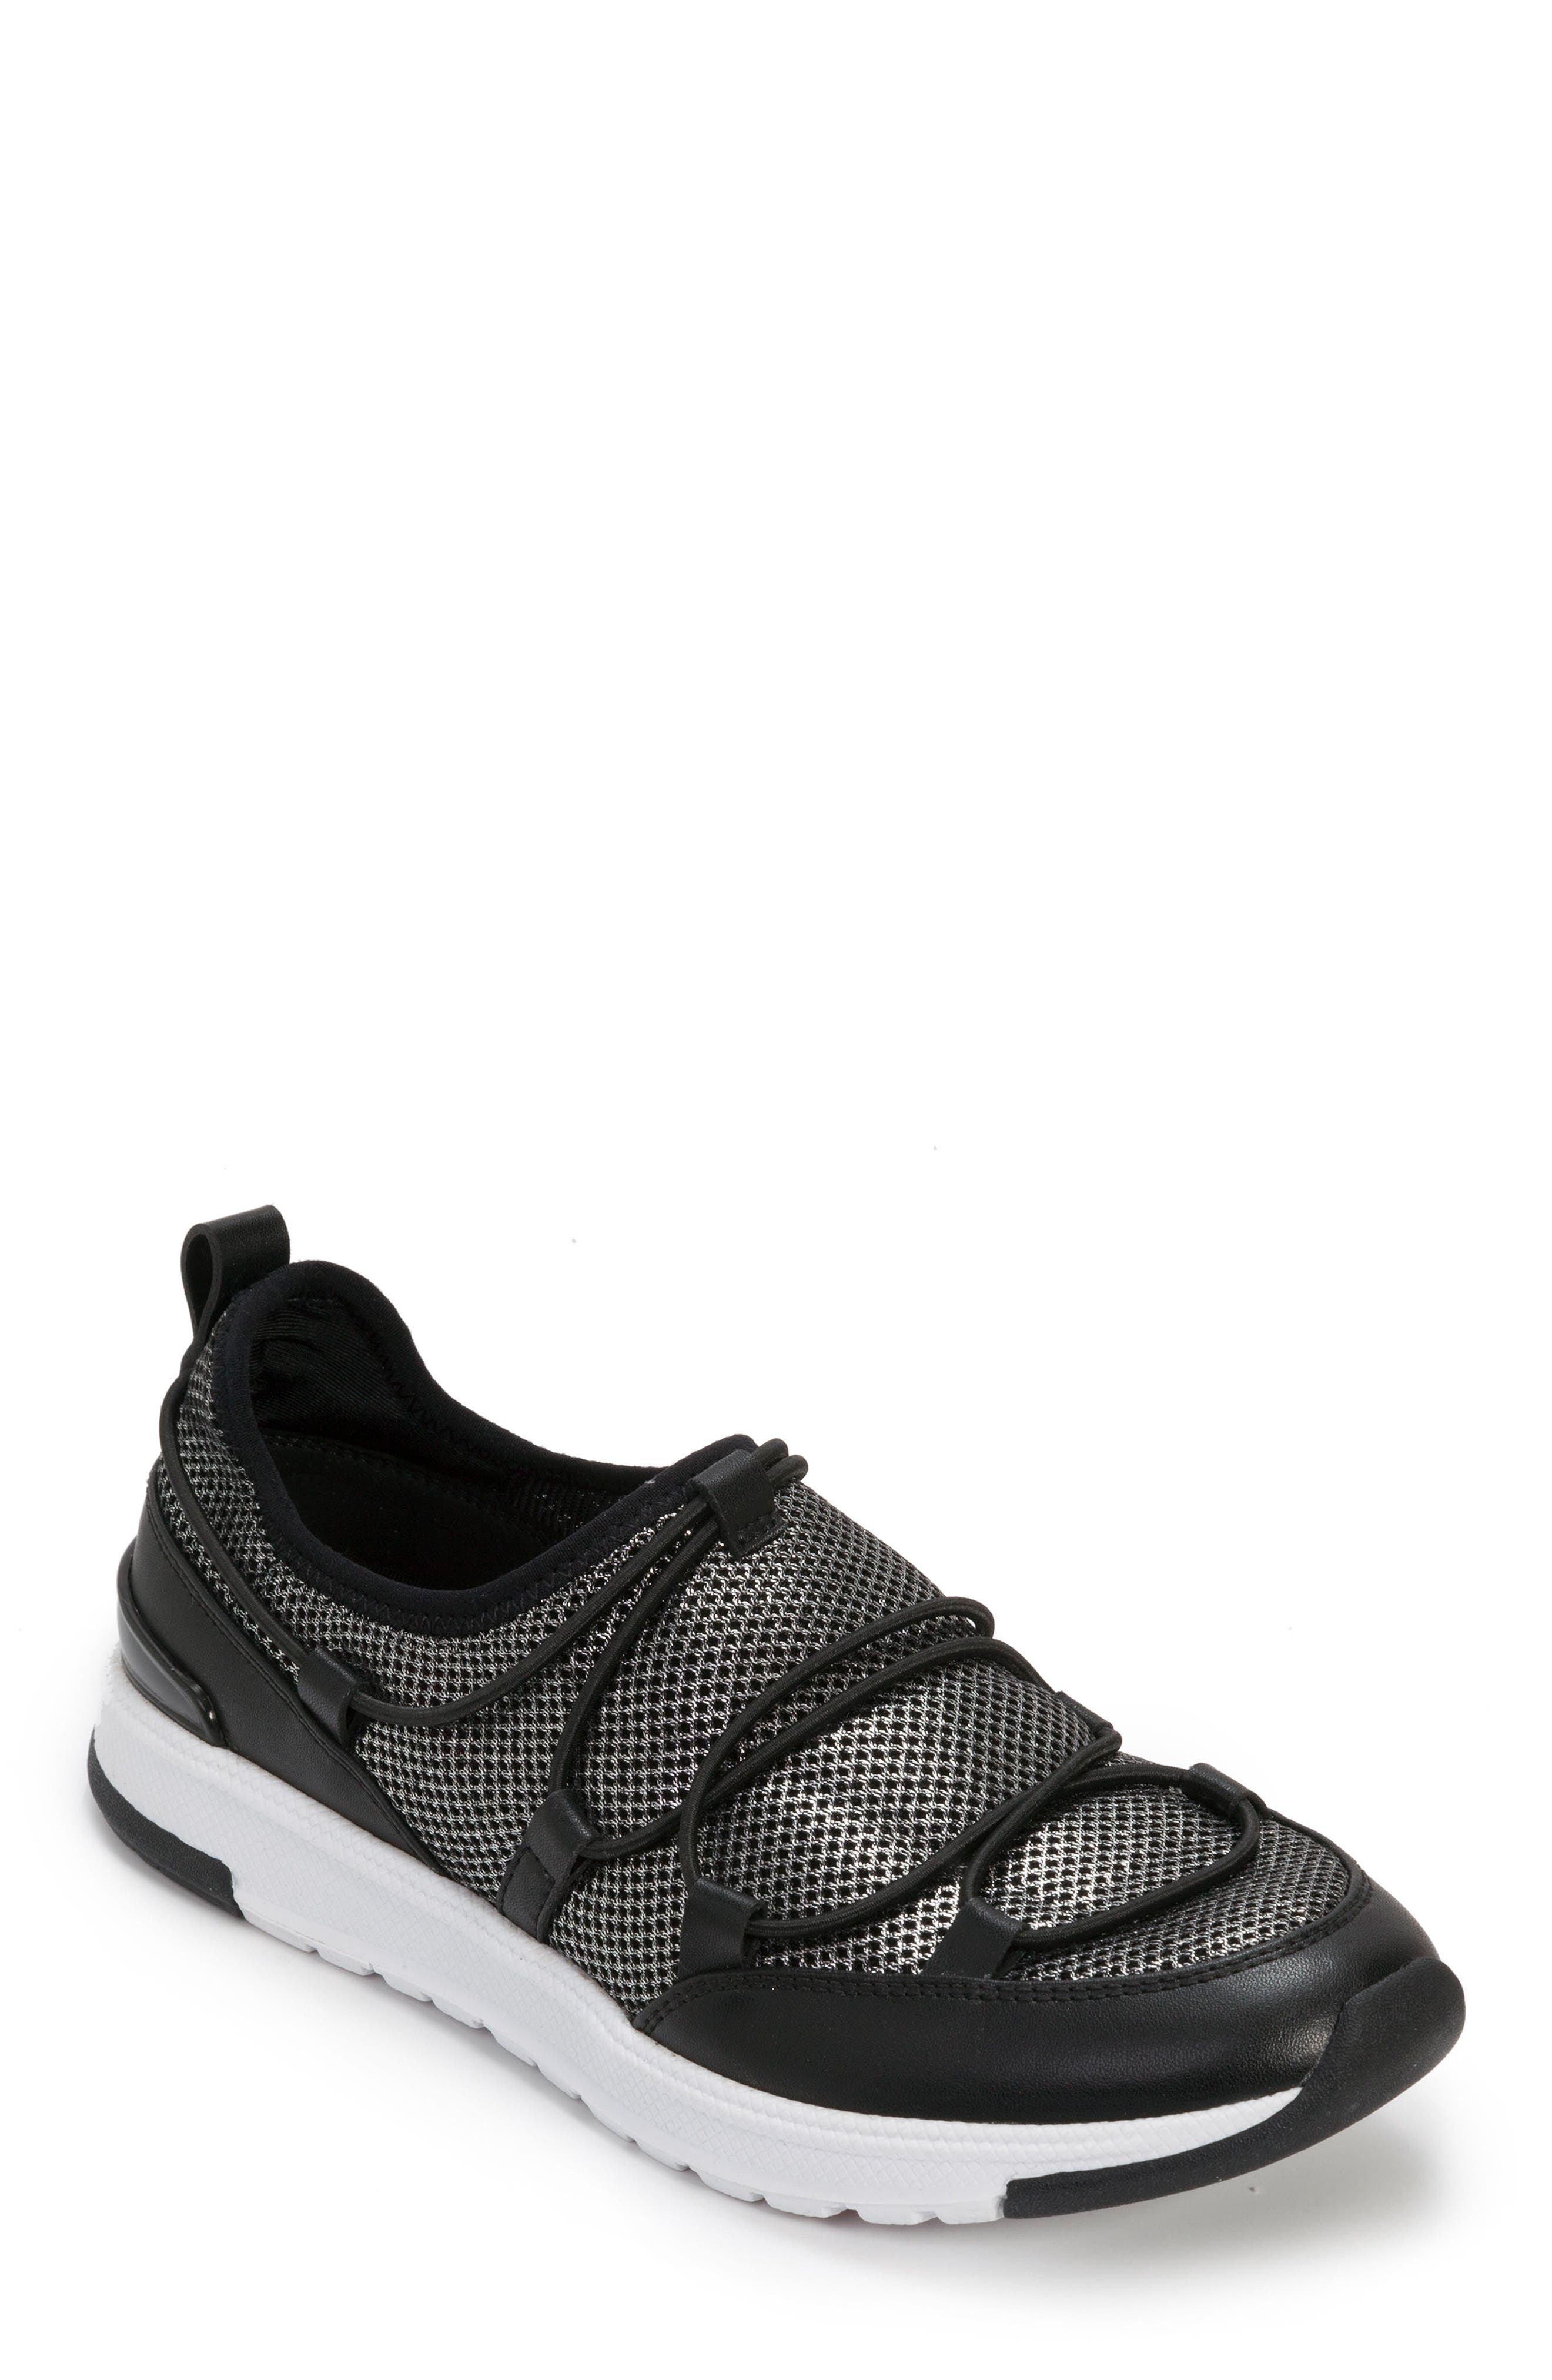 FOOT PETALS, Bree Sneaker, Main thumbnail 1, color, BLACK/ PEWTER